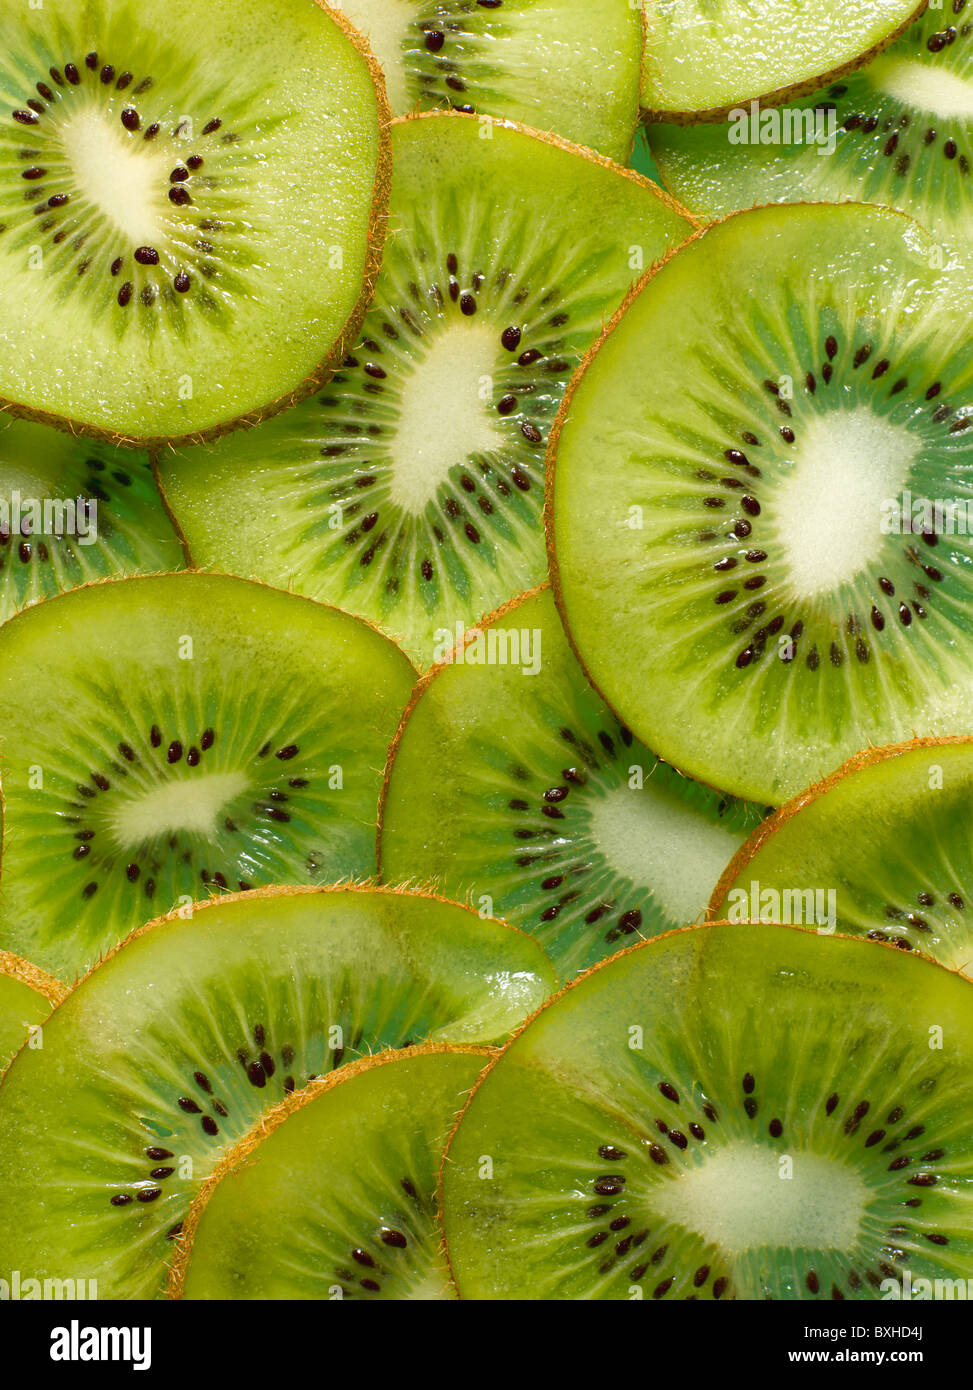 kiwi slices - Stock Image